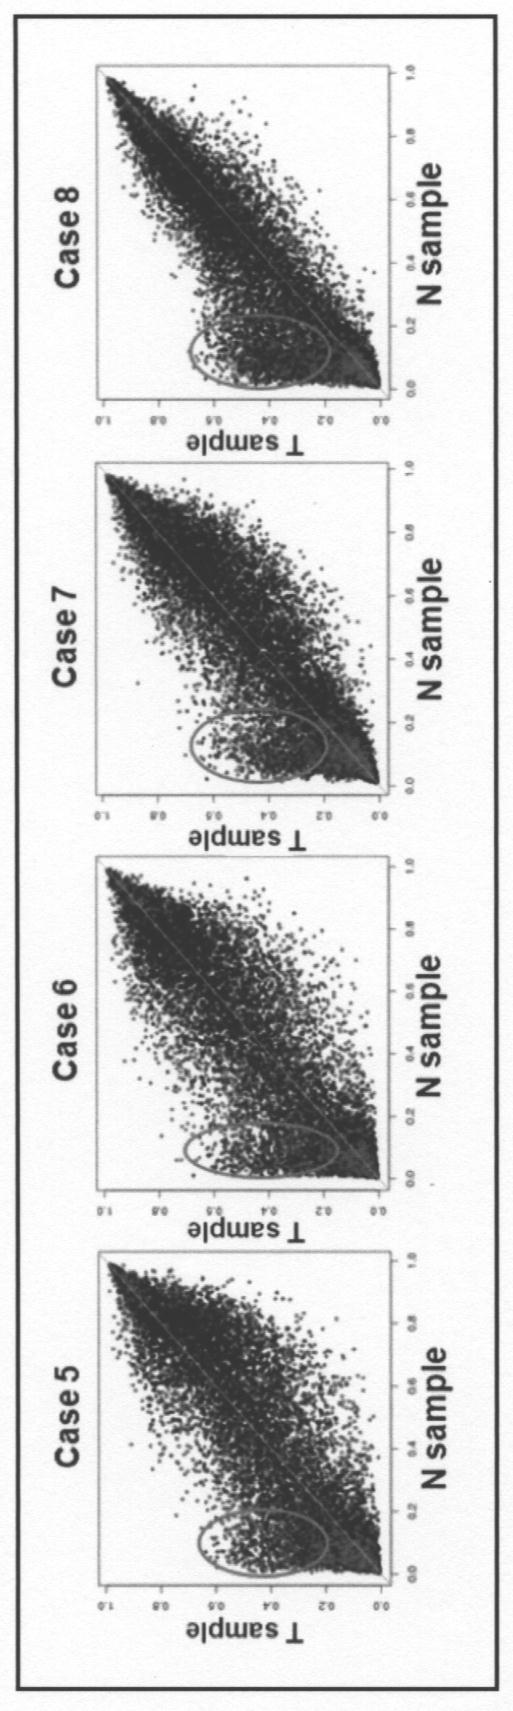 WO2013168644A1 - 腎細胞癌の予後予測方法         - Google PatentsFamily